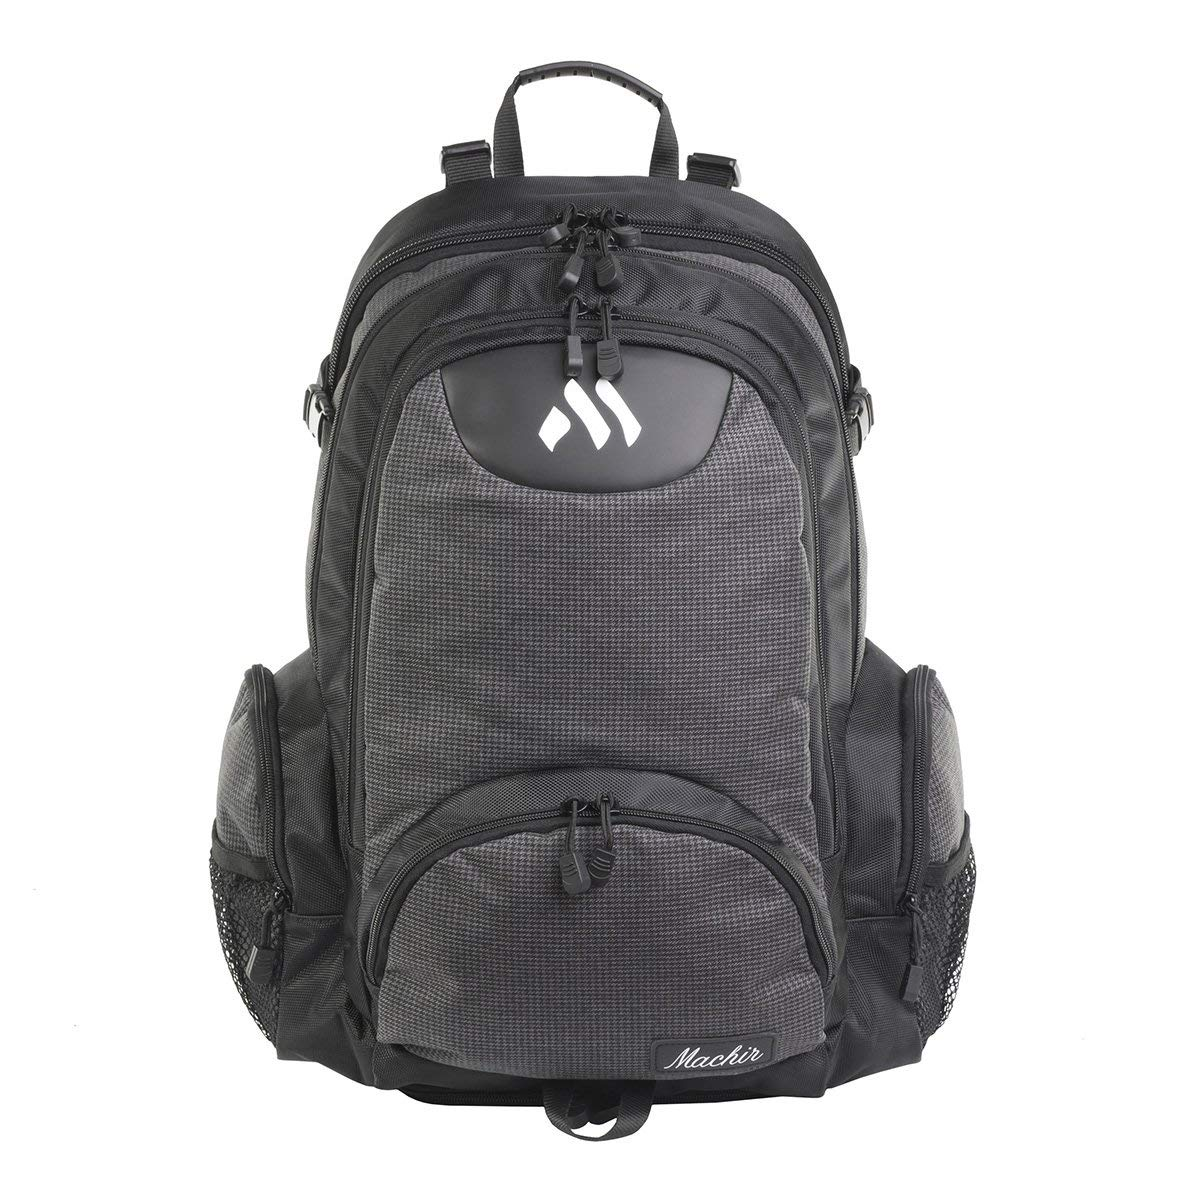 61a117e426 Get Quotations · MACHIR Gym Backpack Shoe Compartment Travel Business Slim  Durable (Avian Millennium Dusk)